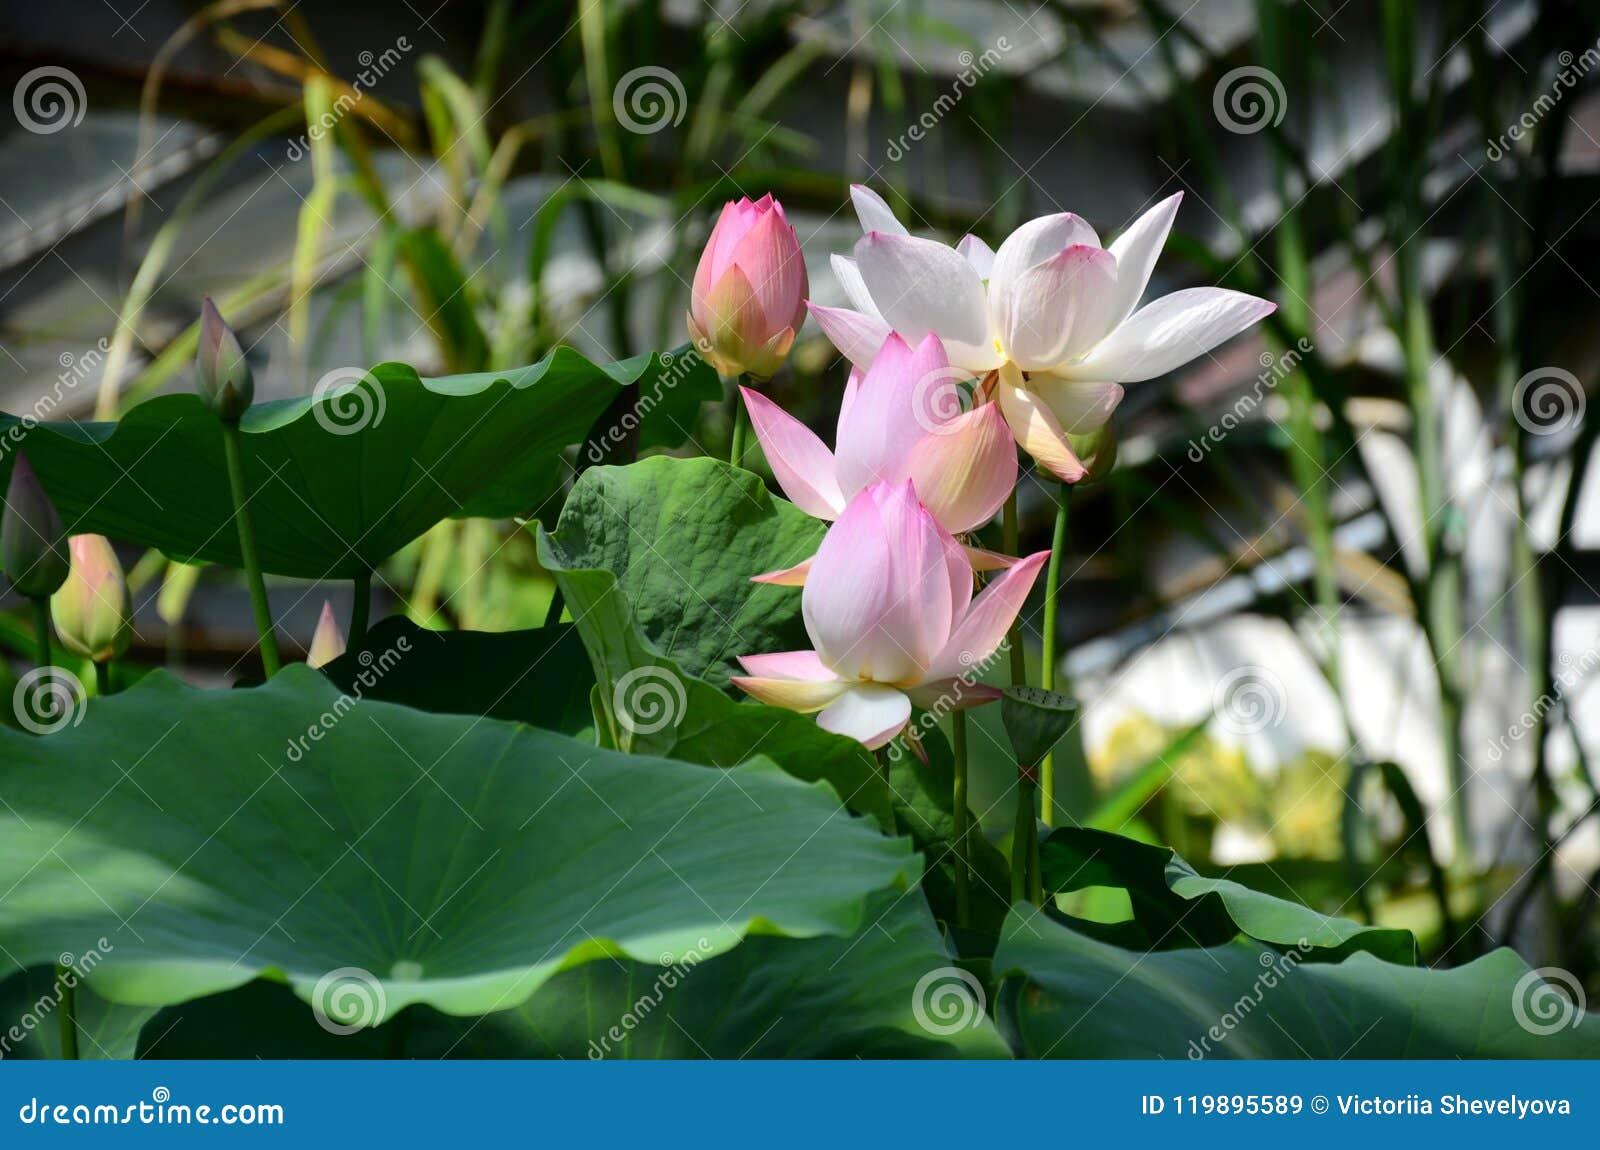 Lotus Flower Harmony Stock Image Image Of Flower 119895589